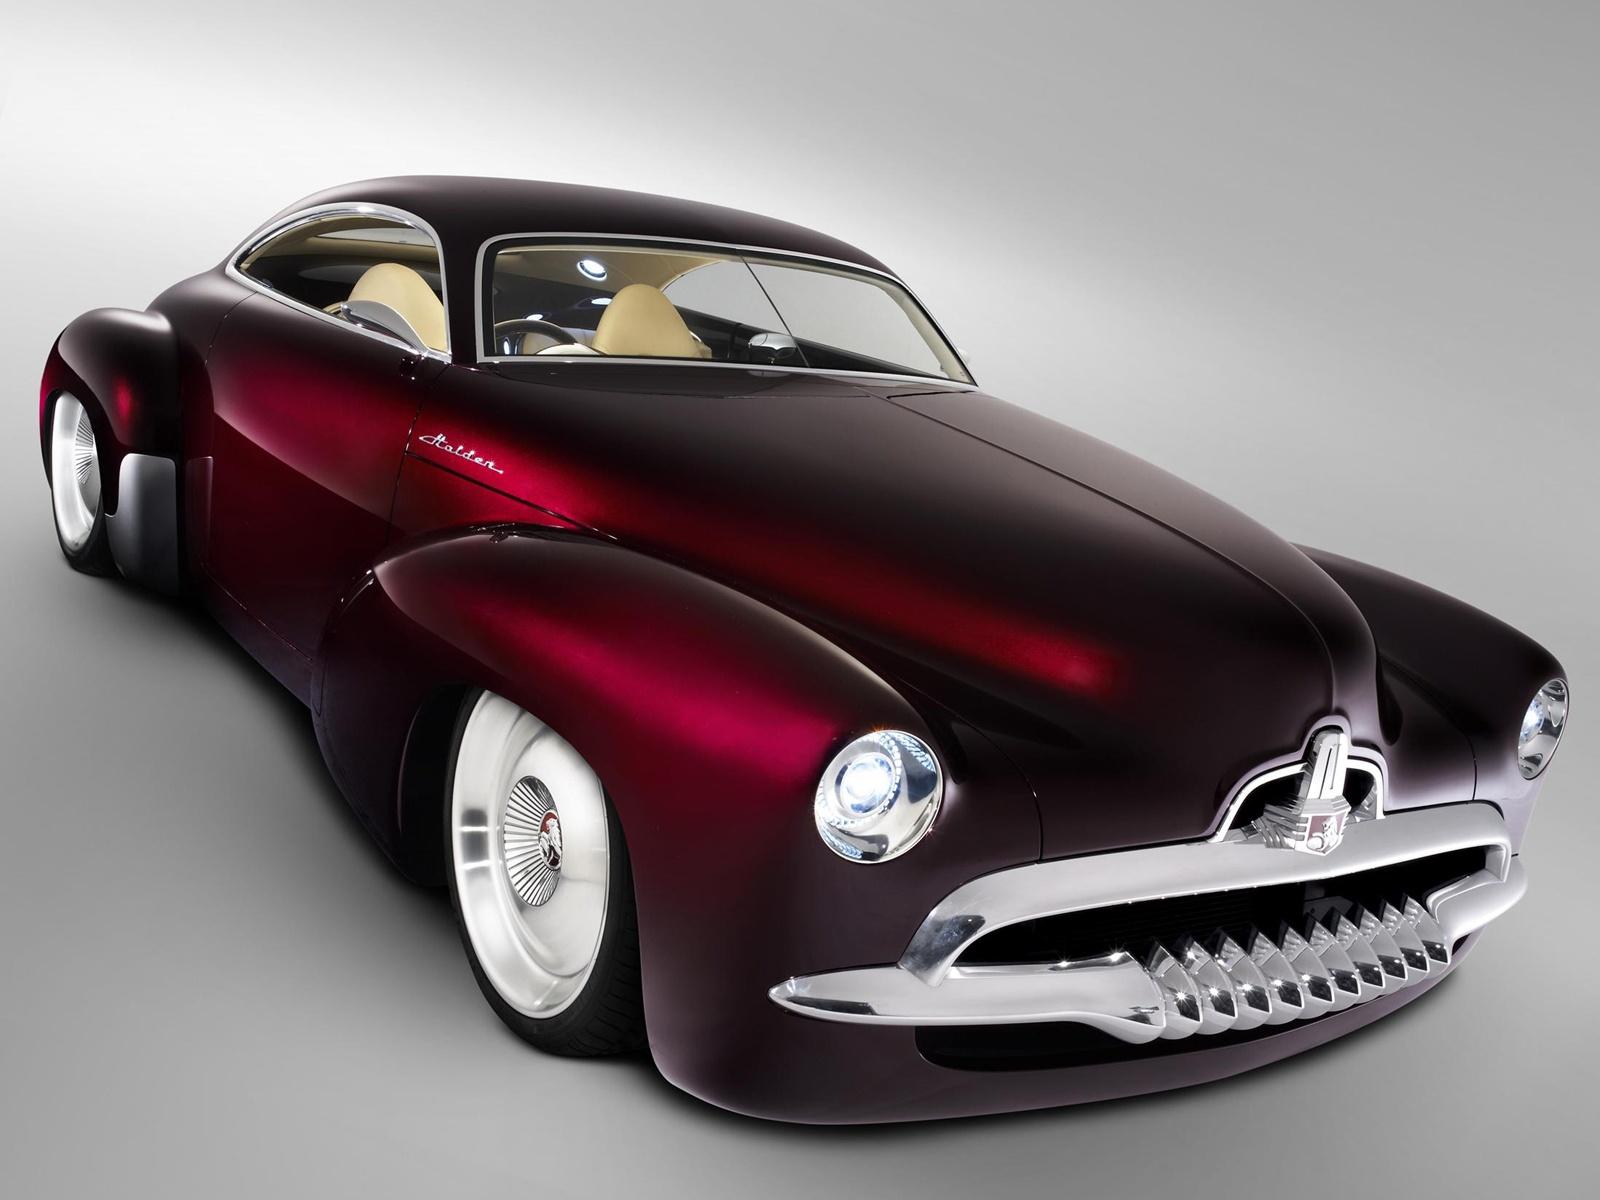 Classic Car Wallpapers Wallpaper Pics Pictures Hd for Desktop 1600x1200